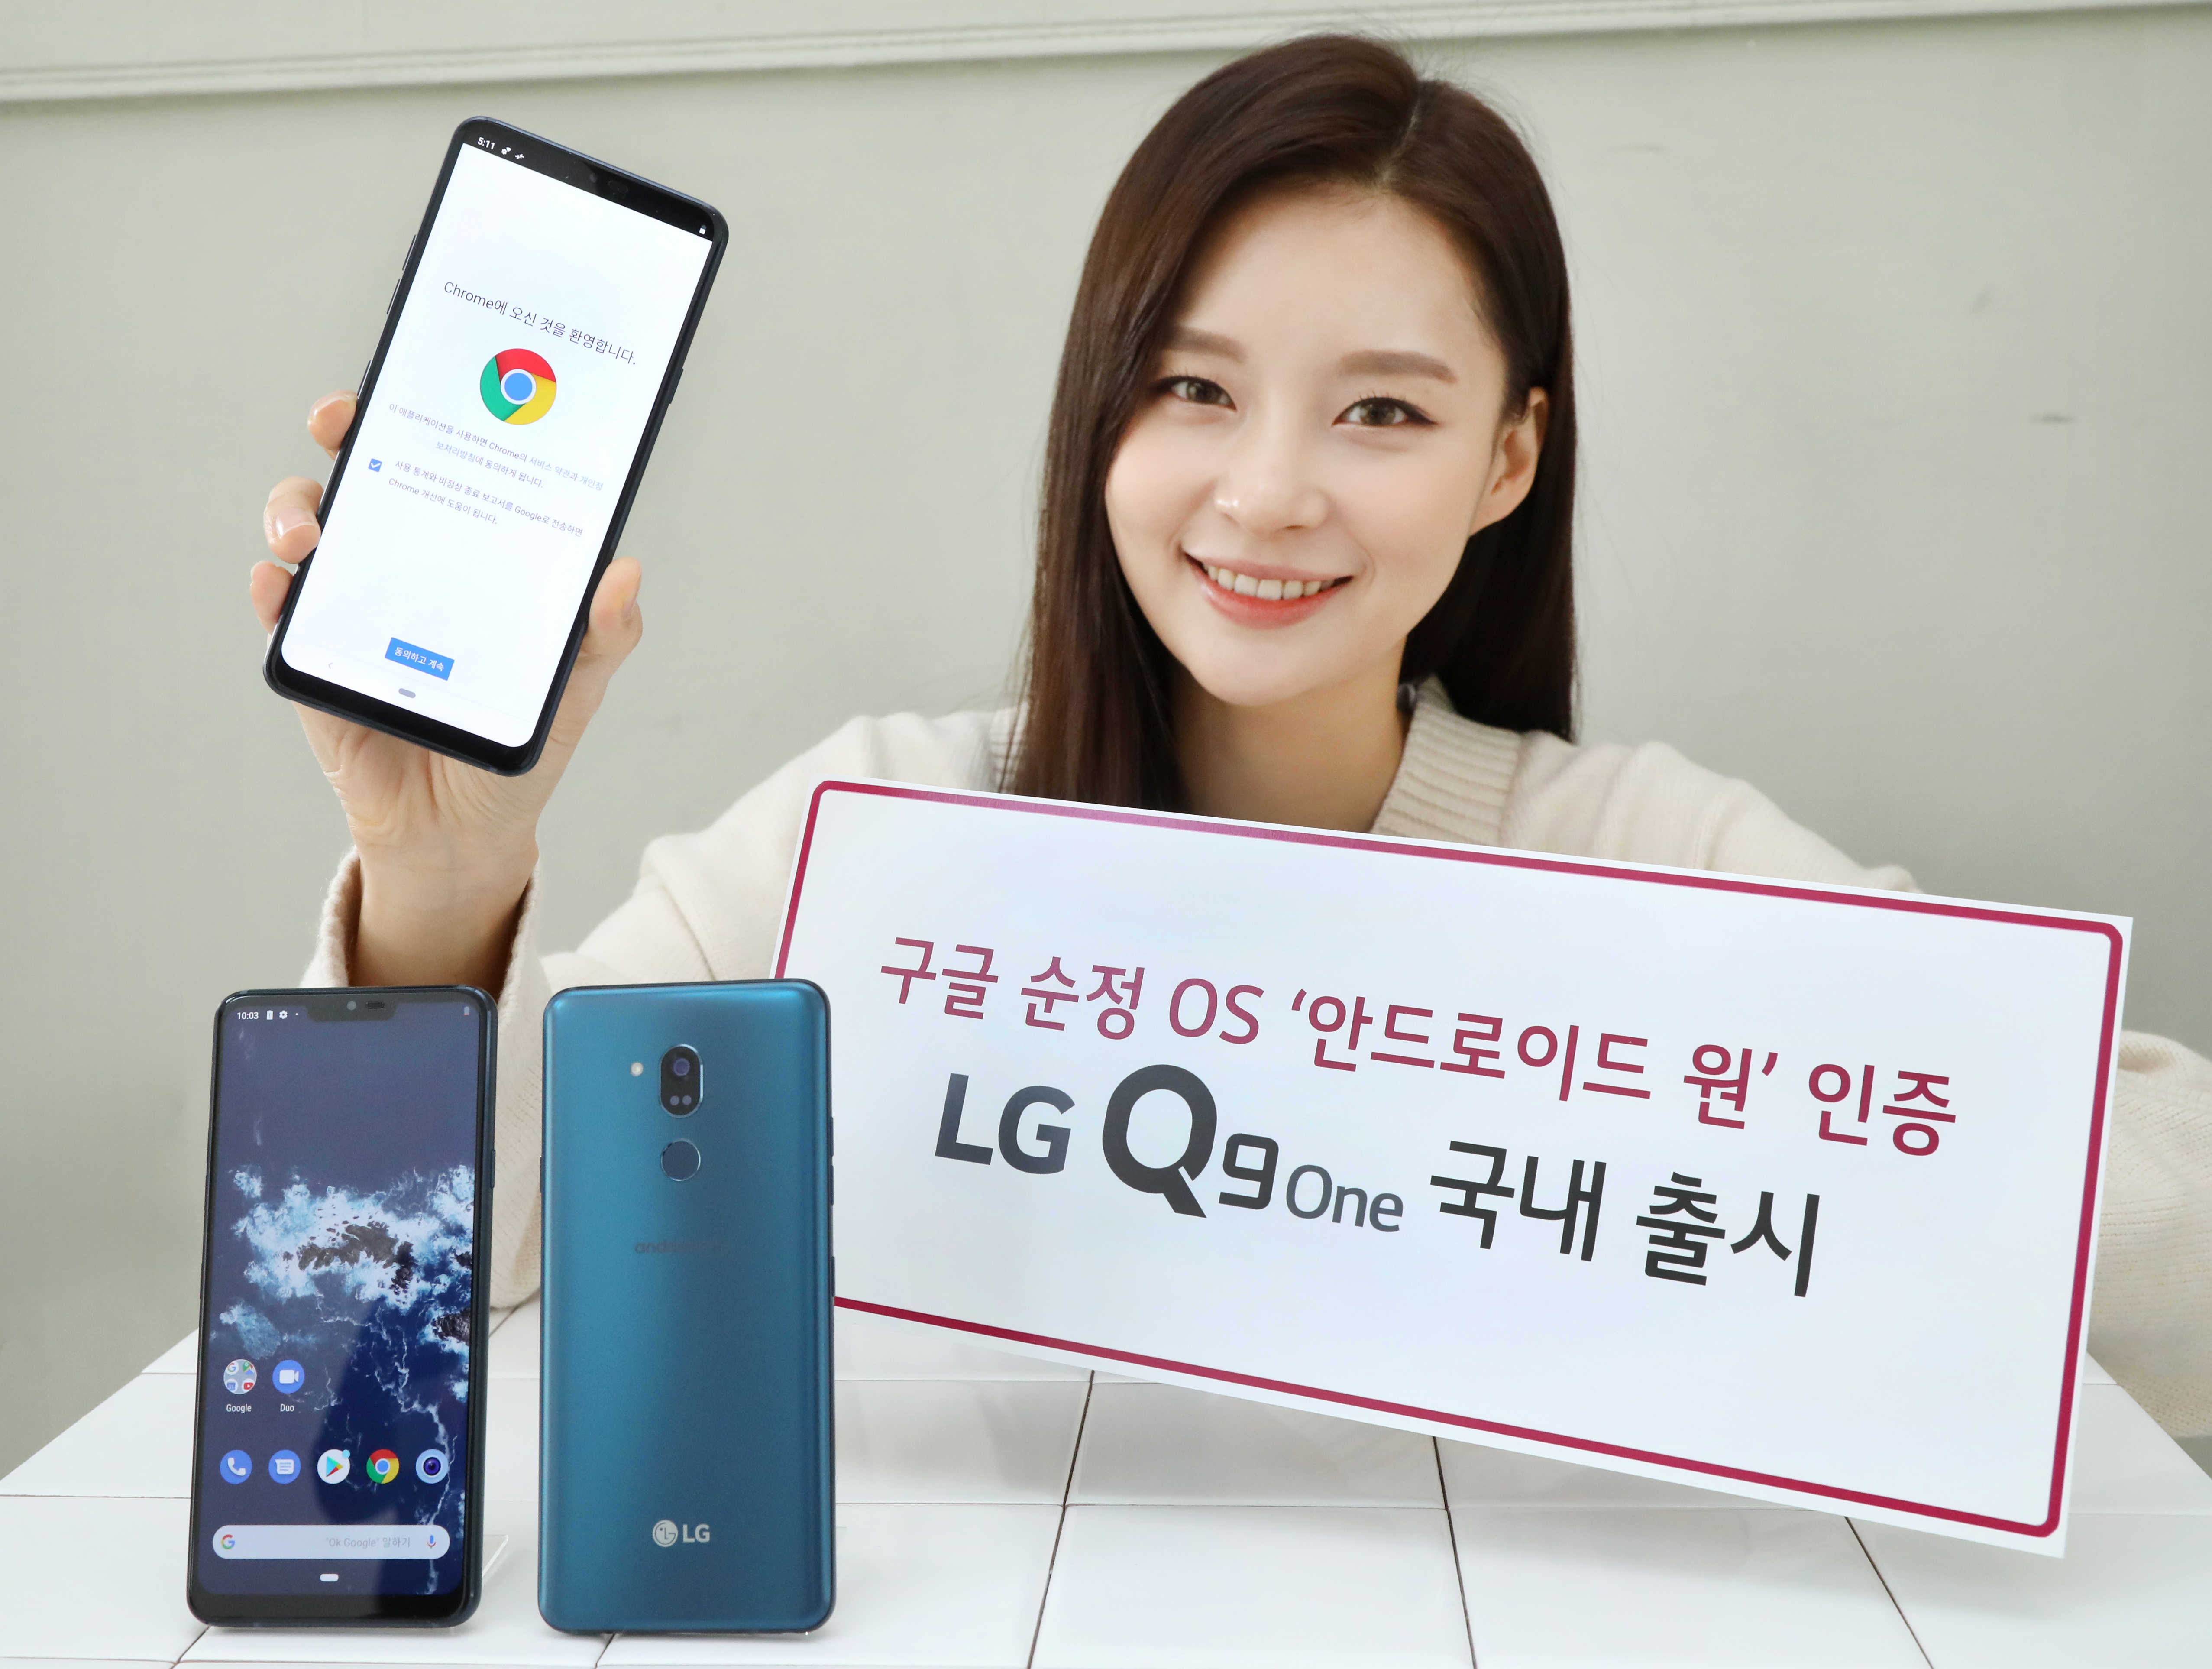 LG Q9 One South Korea